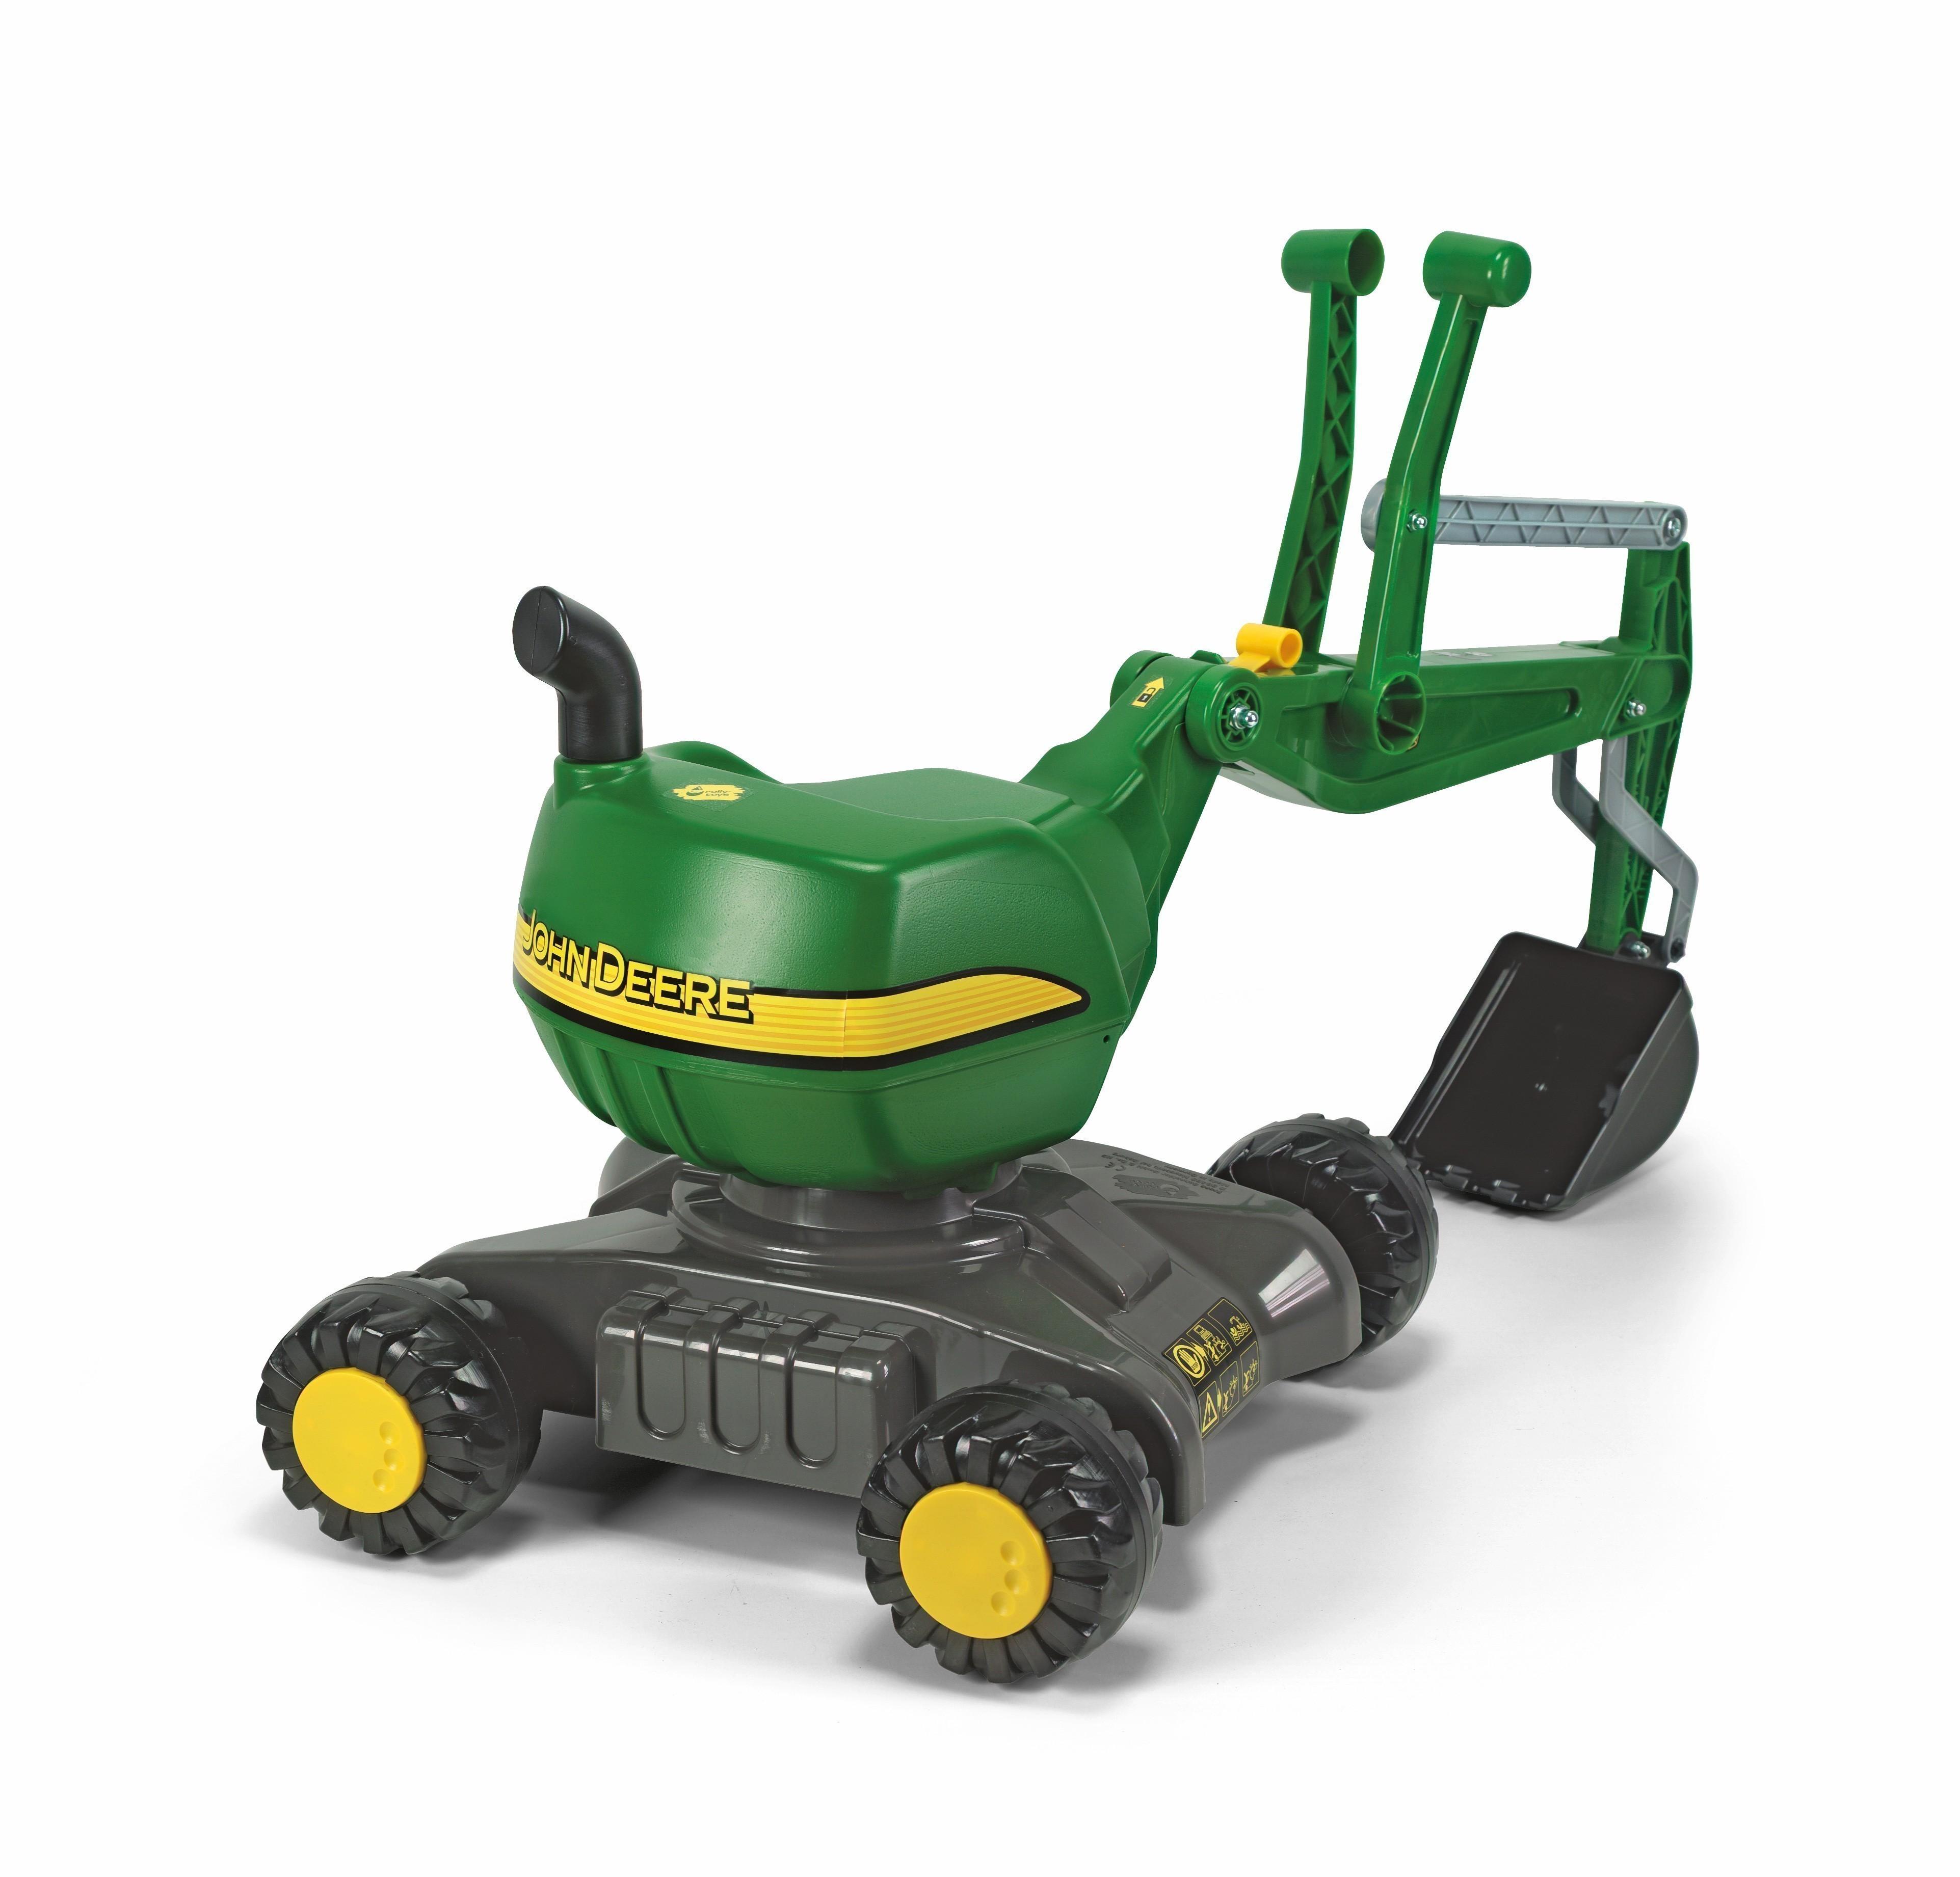 Rutschfahrzeug / Spielzeug-Bagger rolly Digger John Deere - Rolly Toys Bild 2